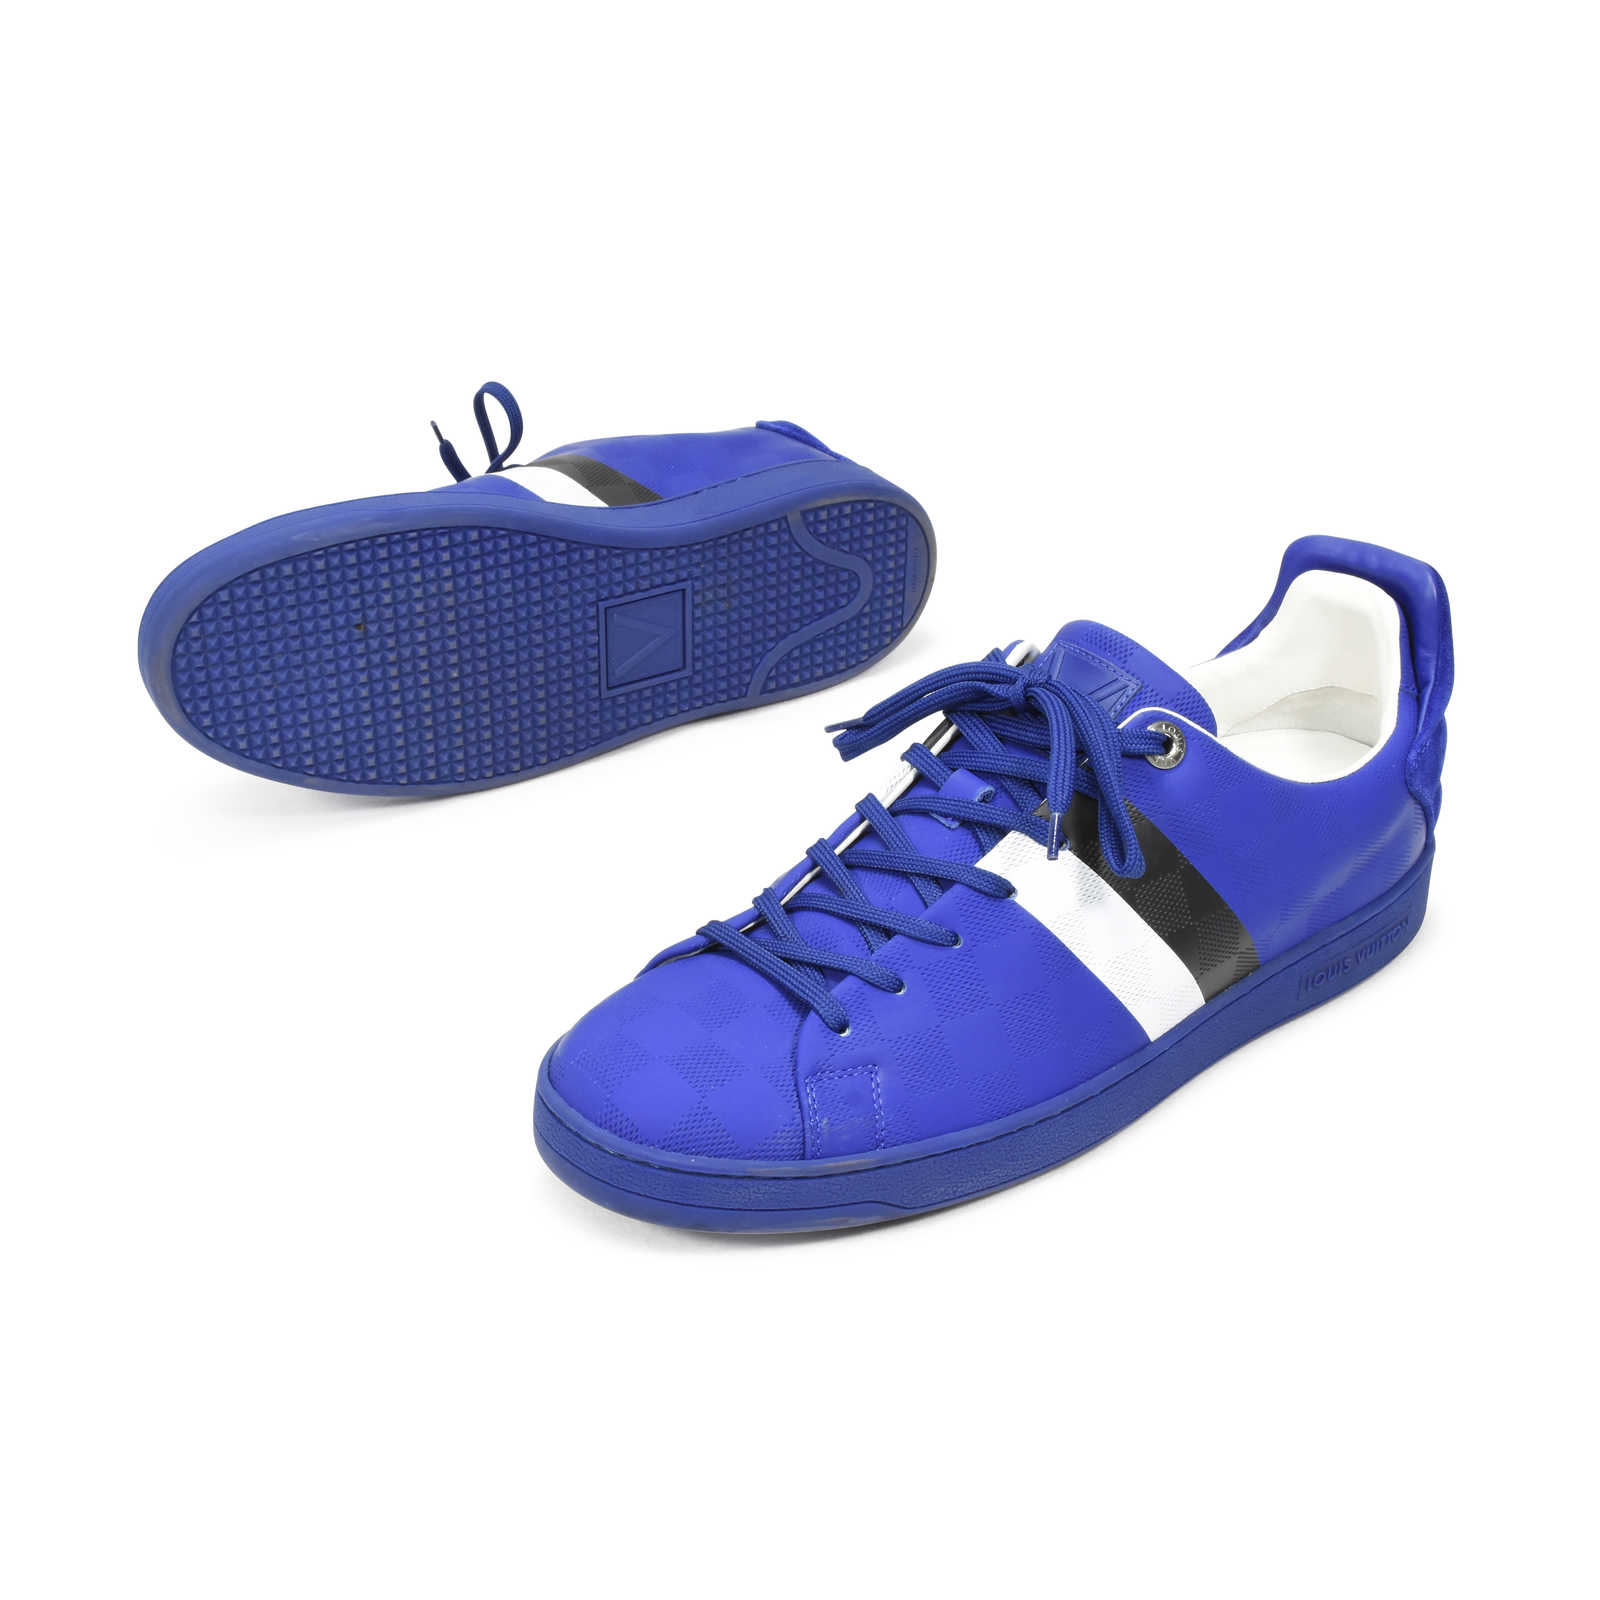 e27a3dca6698 ... Authentic Second Hand Louis Vuitton Frontrow Sneaker (PSS-332-00018) -  Thumbnail ...